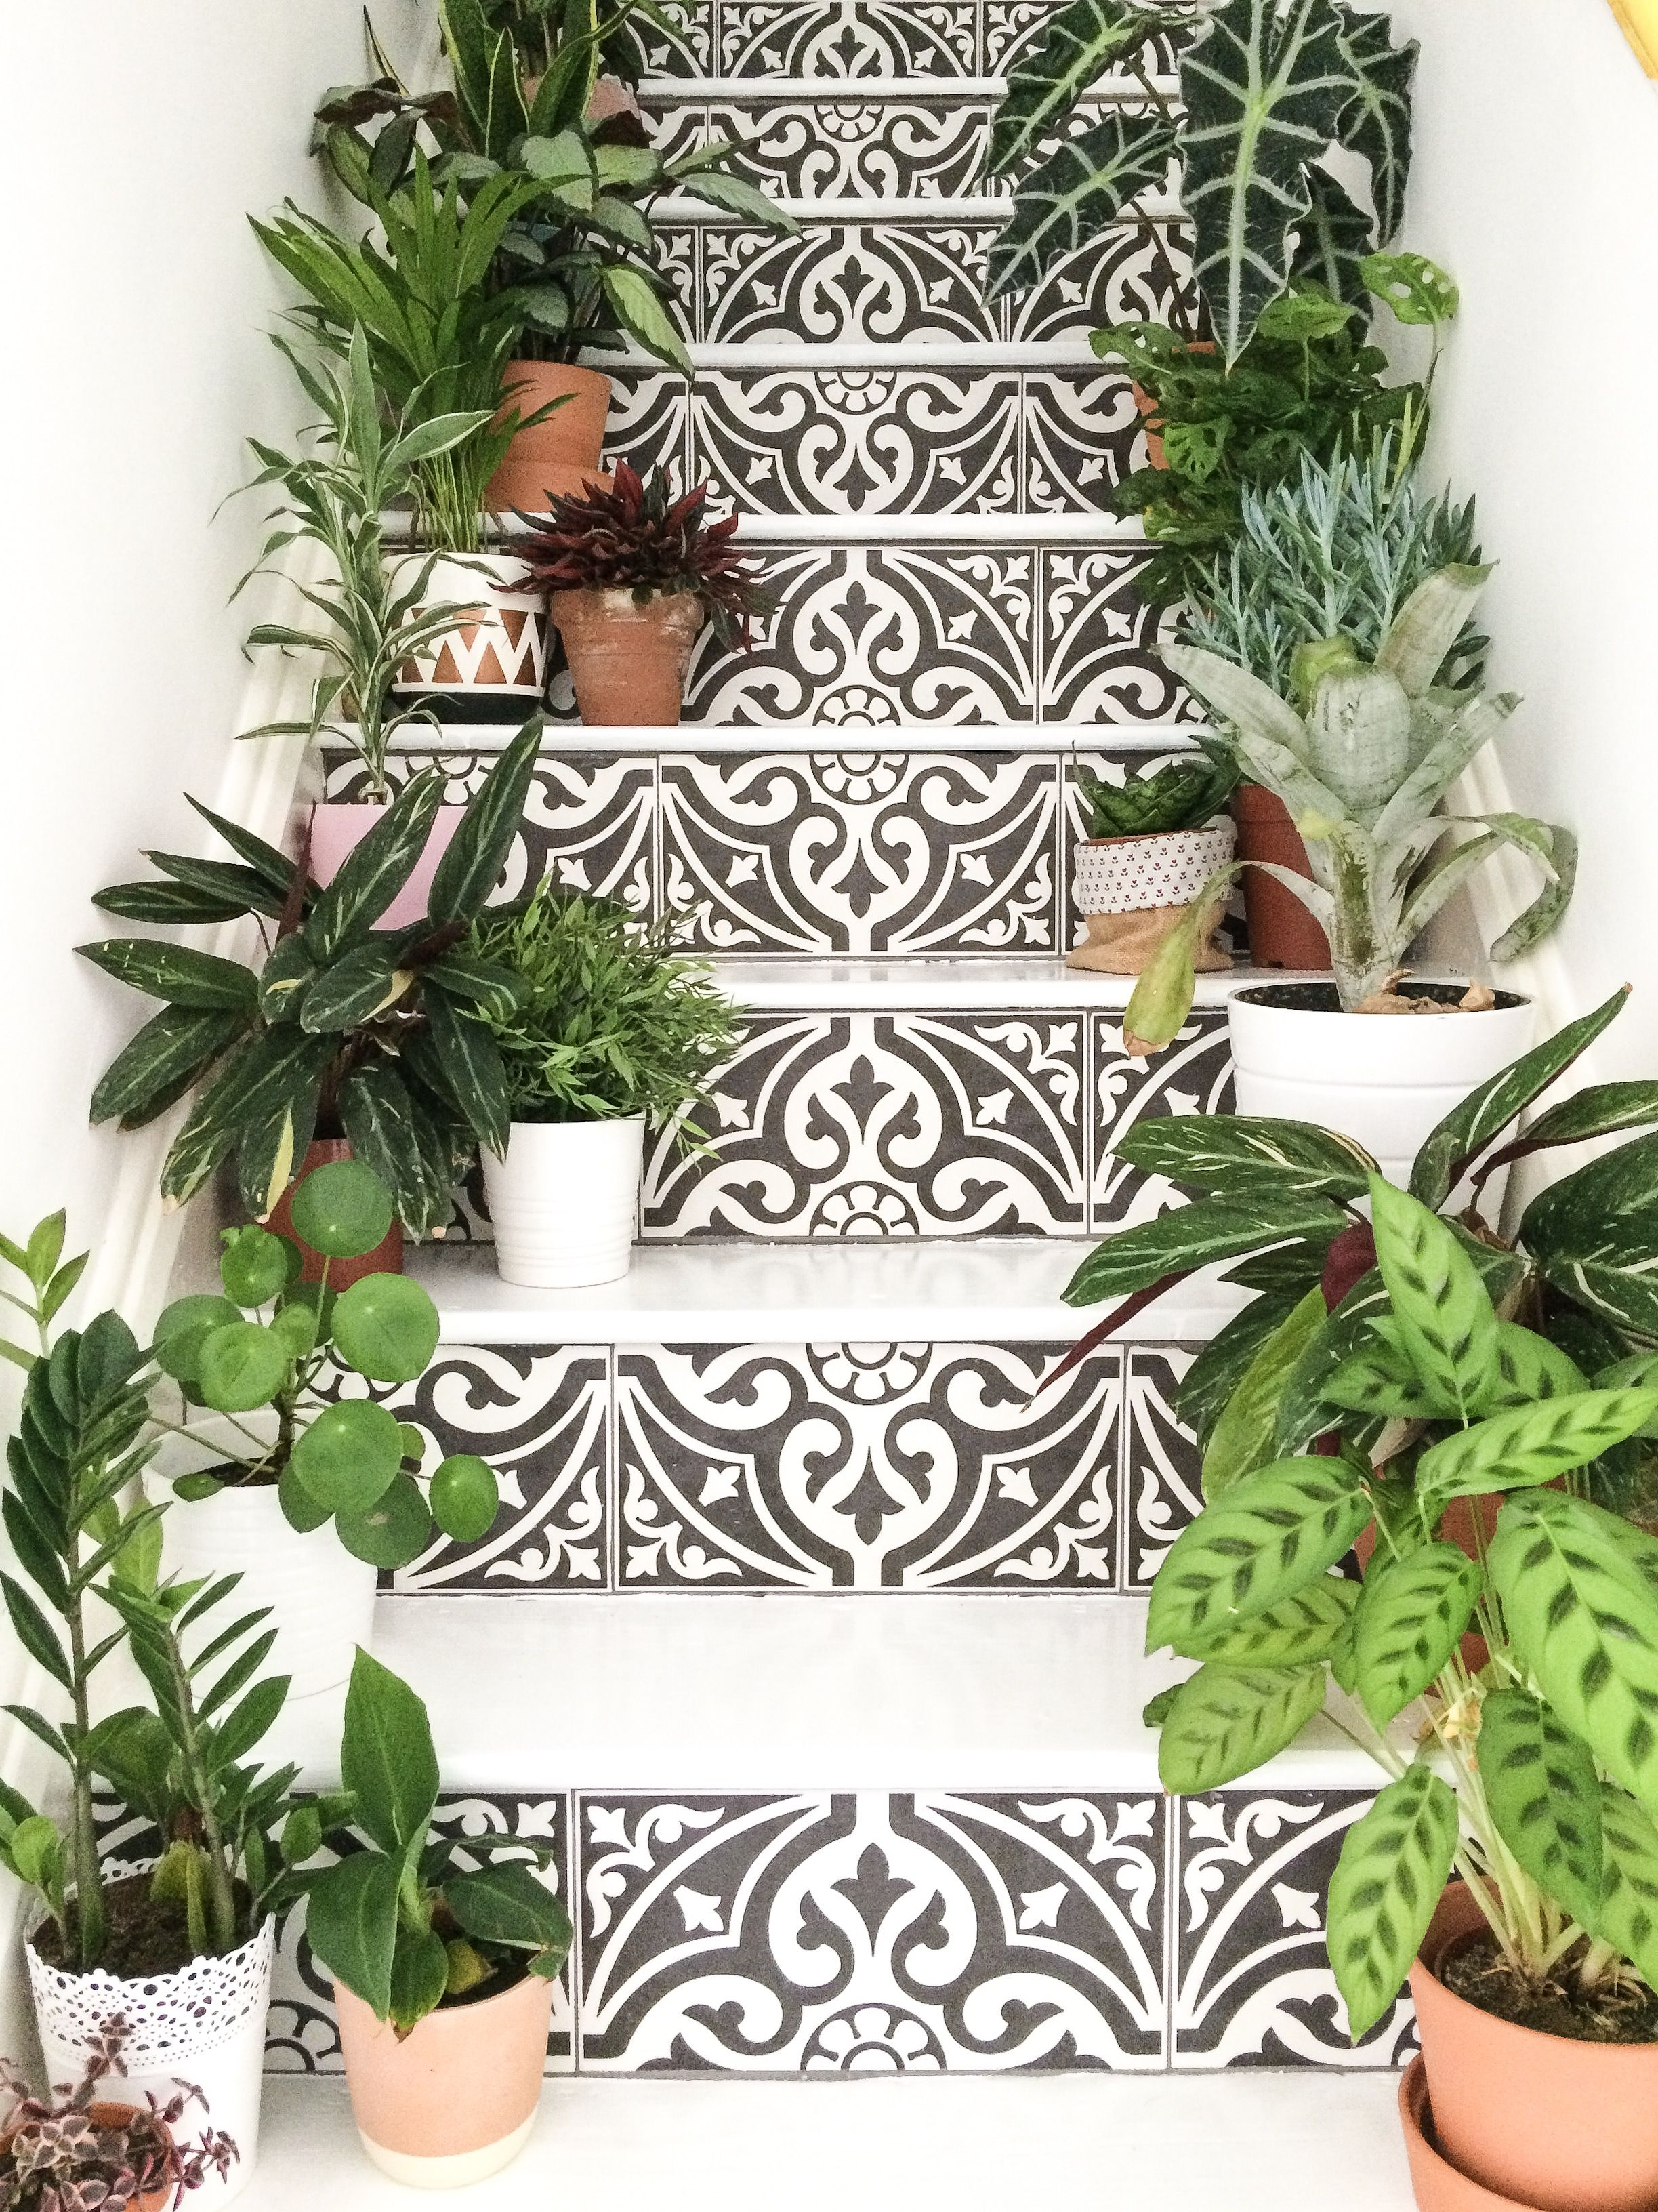 Houseplants veg design pinterest houseplants plants and tile